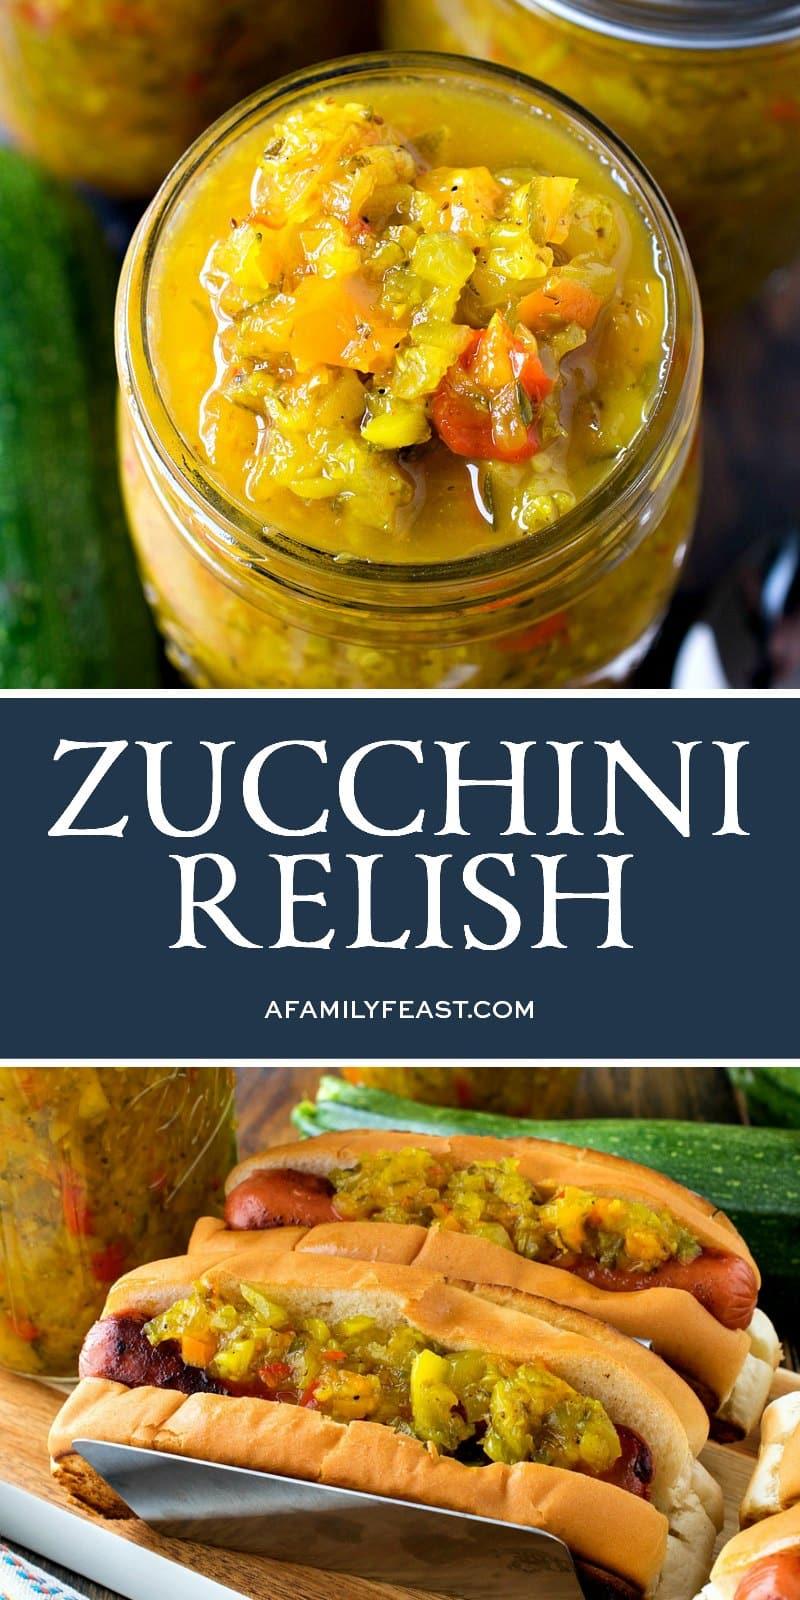 Zucchini Relish - A Family Feast